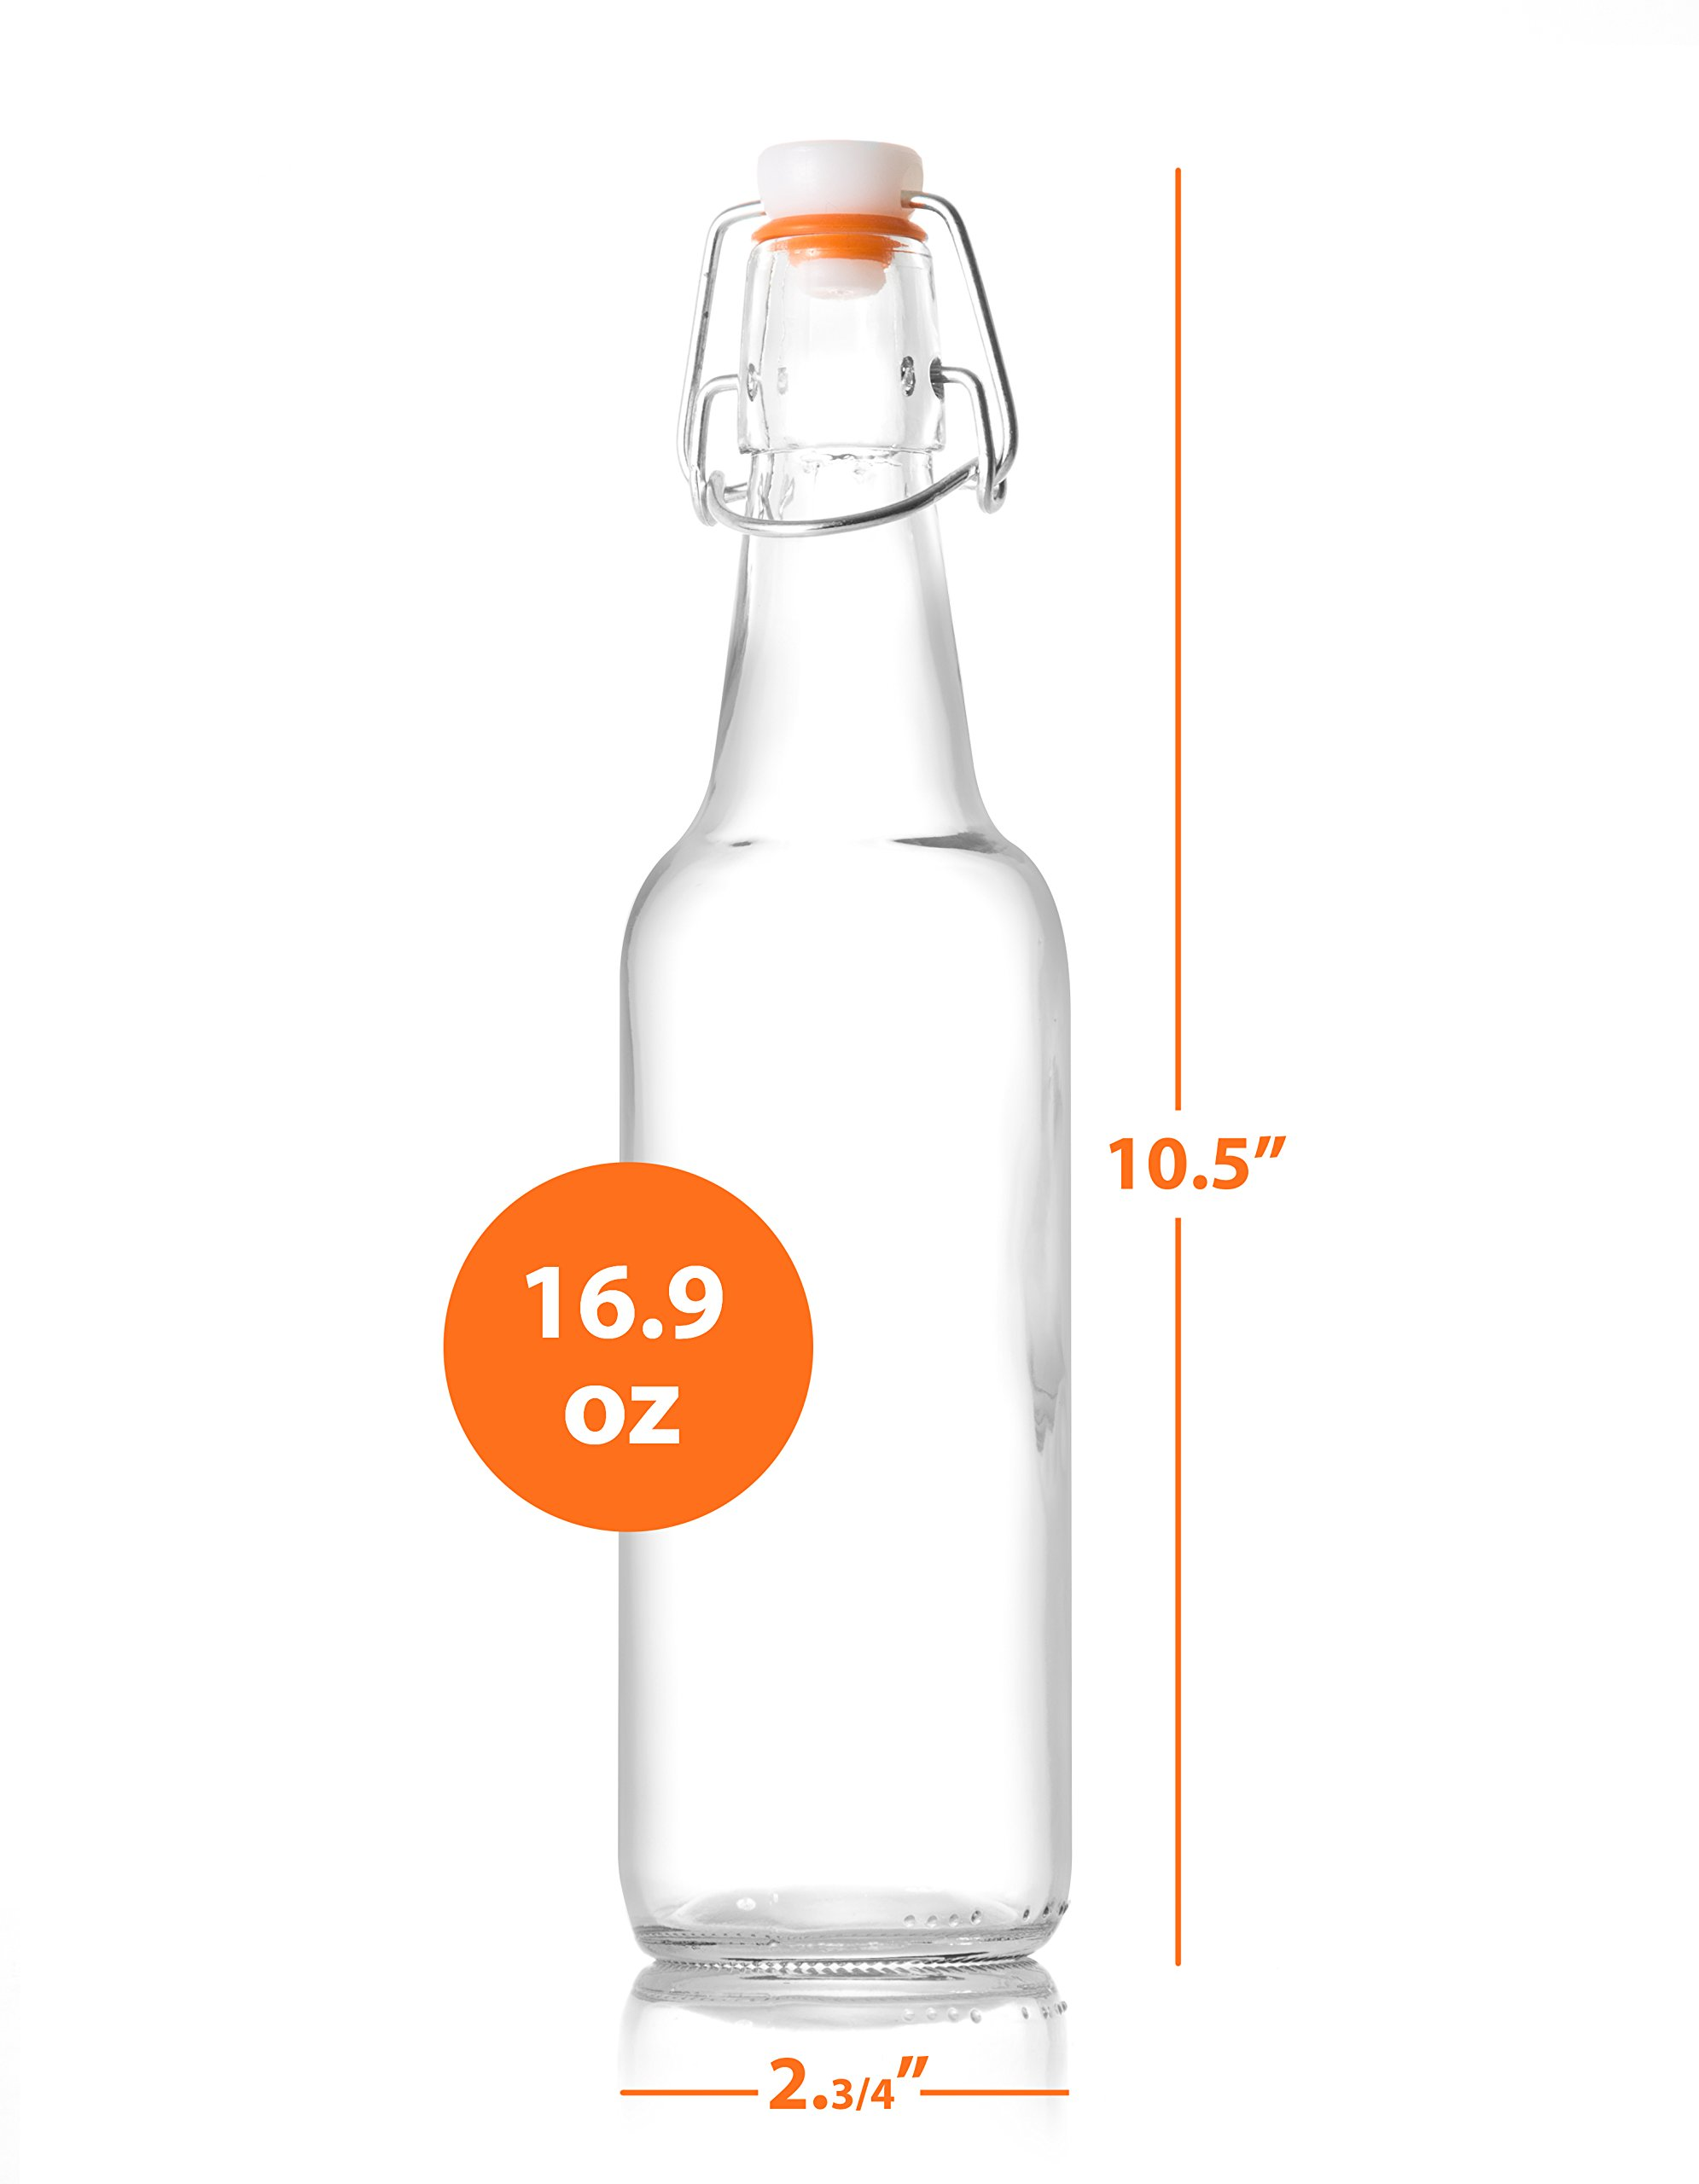 Zuzoro Glass Kombucha Bottles For Home Brewing Kombucha Kefir or Beer - 16 oz Clear Glass Grolsch Bottles case of 6 w/ Easy Swing top Cap w/ Gasket Seal Tight by Zuzuro (Image #4)